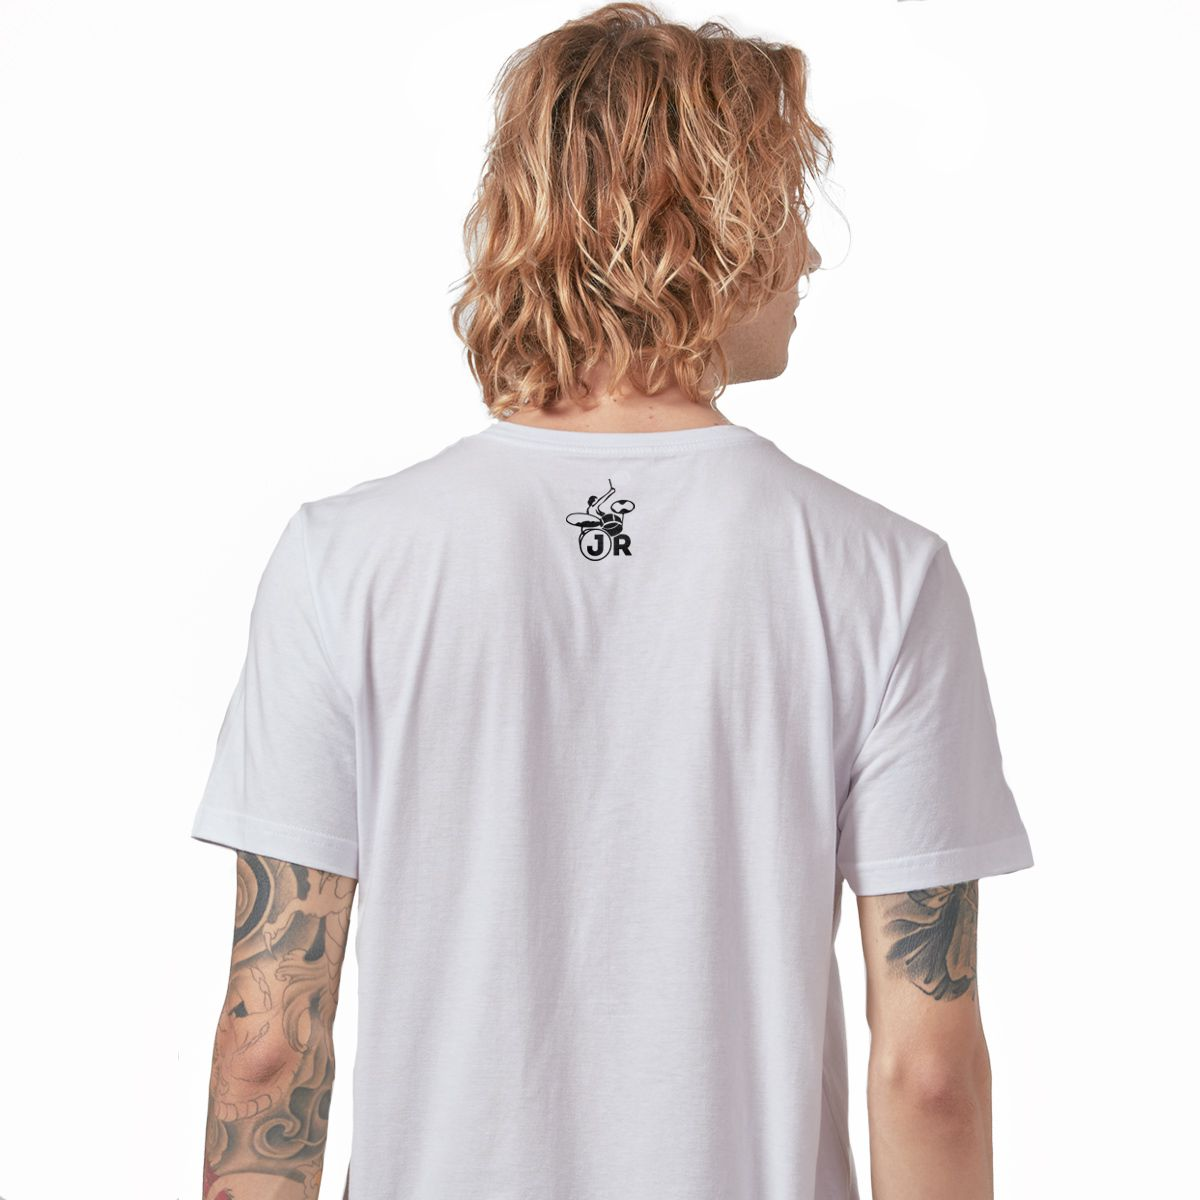 Camiseta Masculina João Rock Rock N' Roll